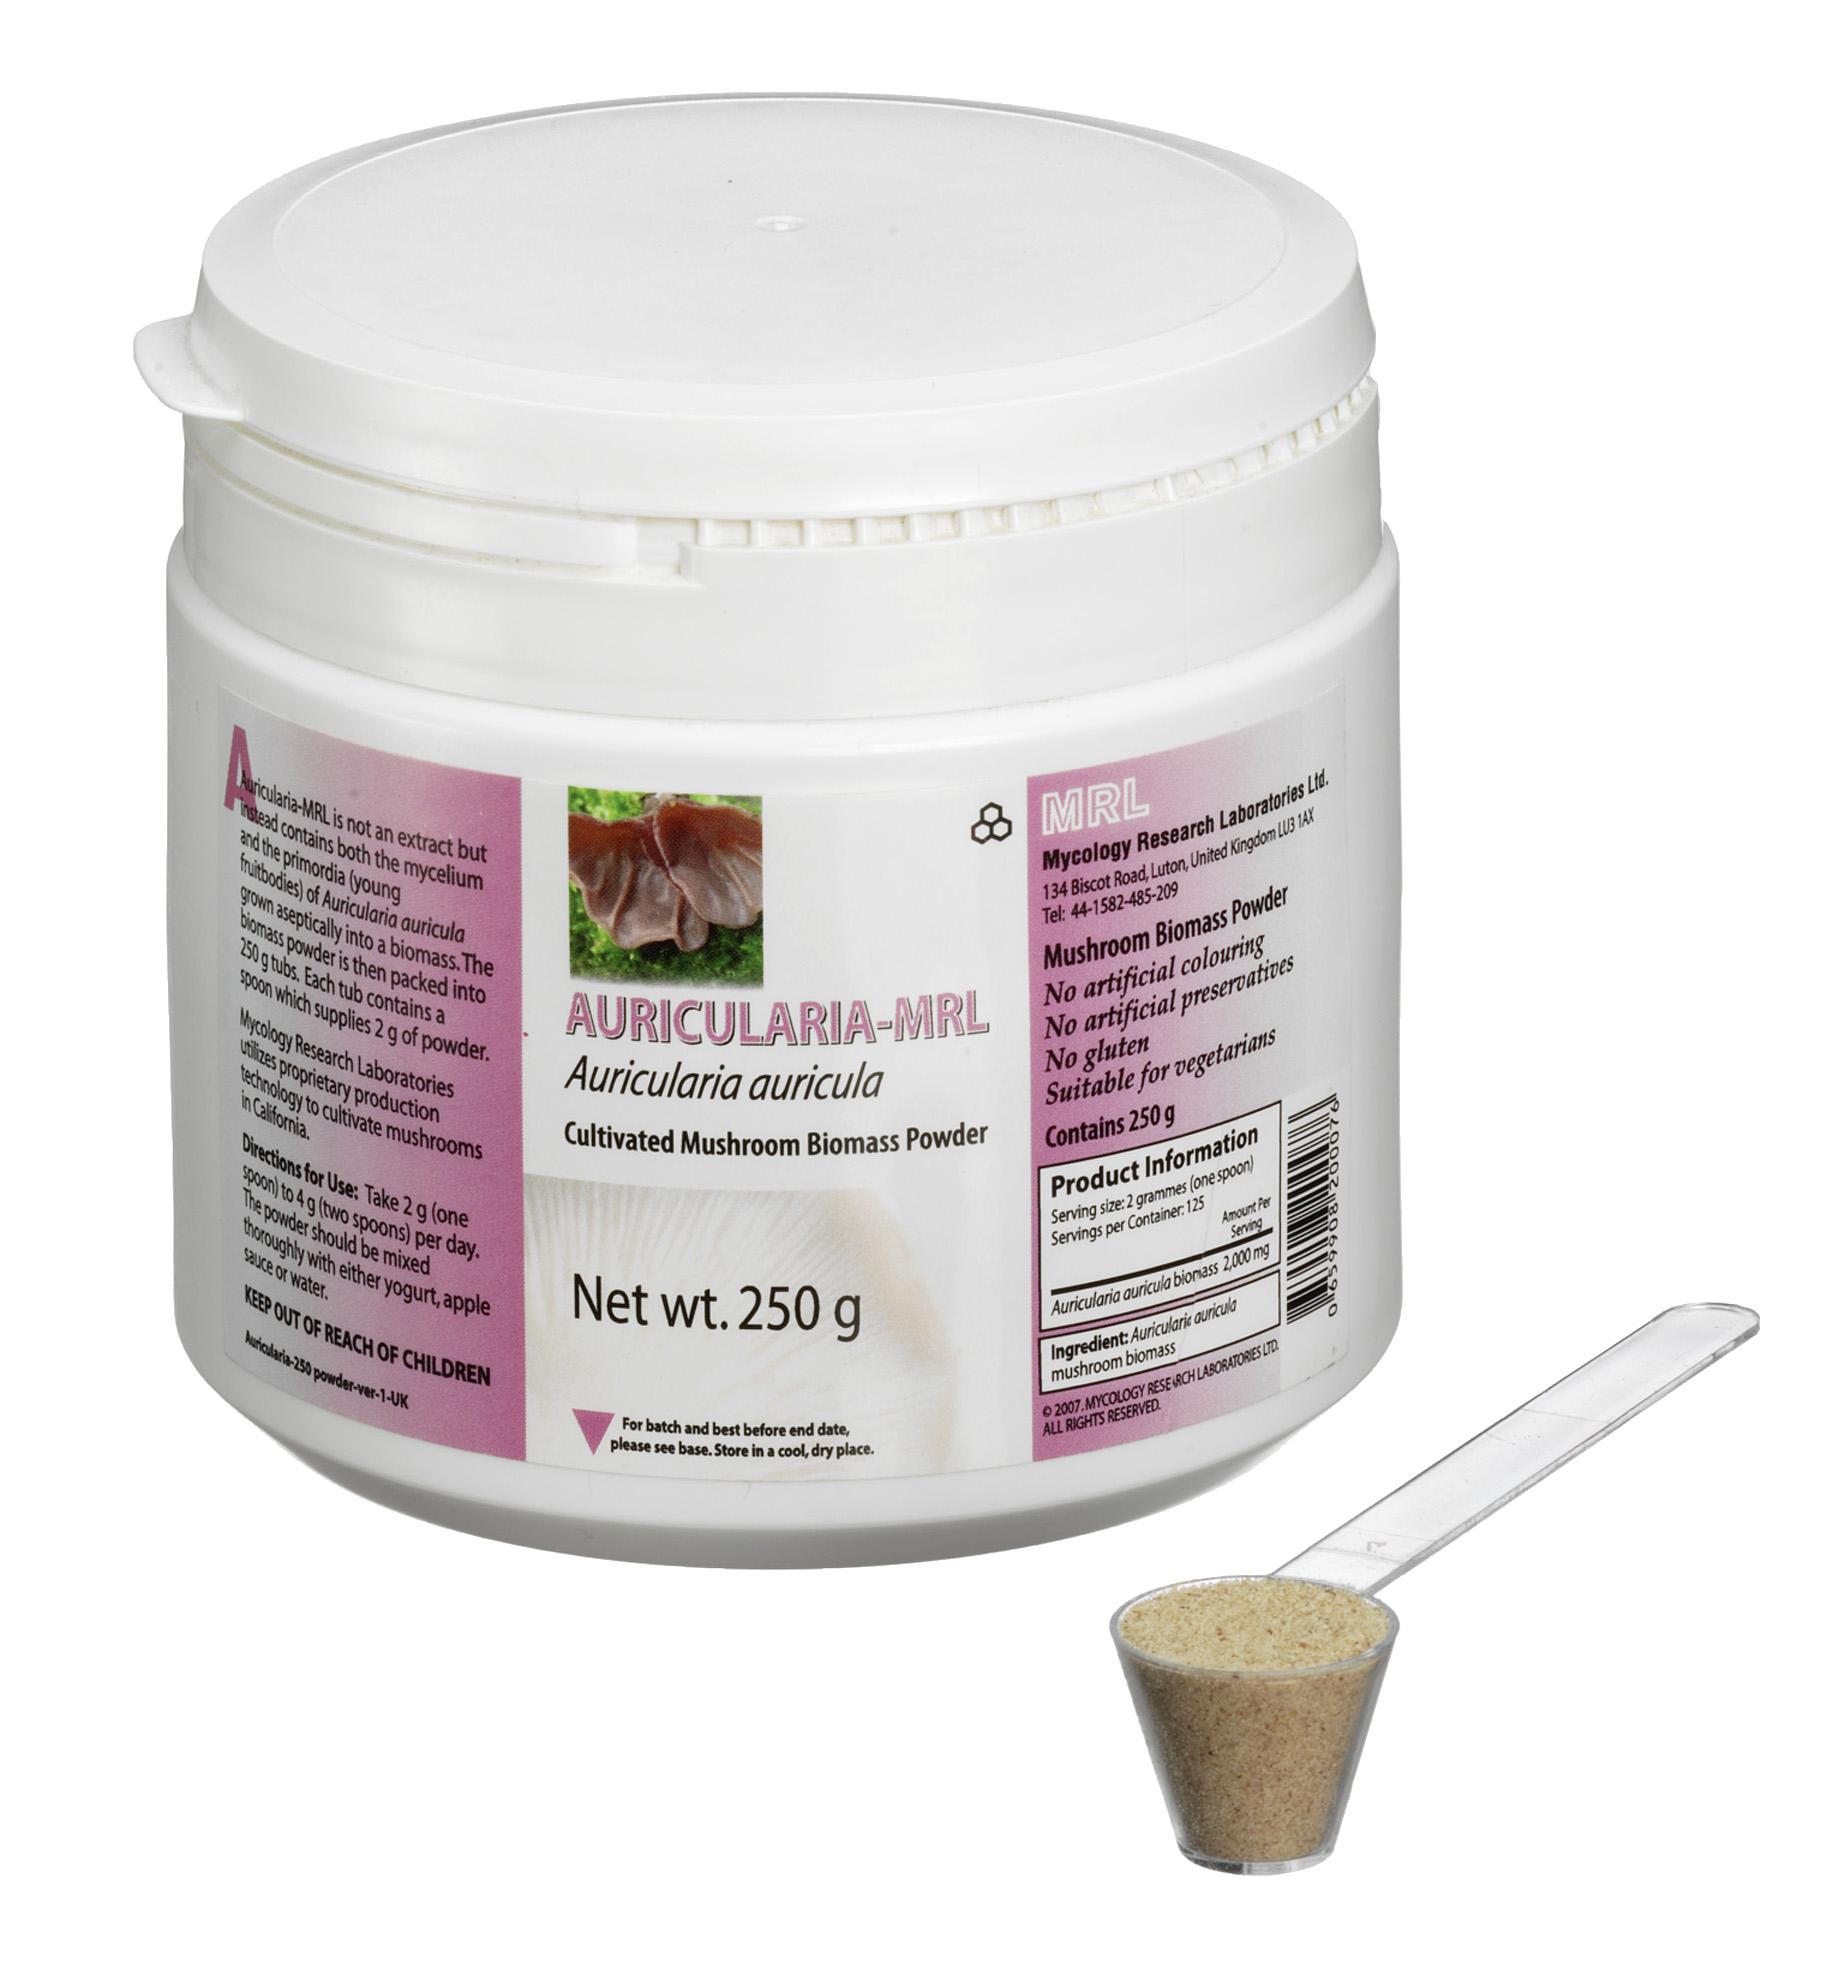 Auricularia-MRL 250g